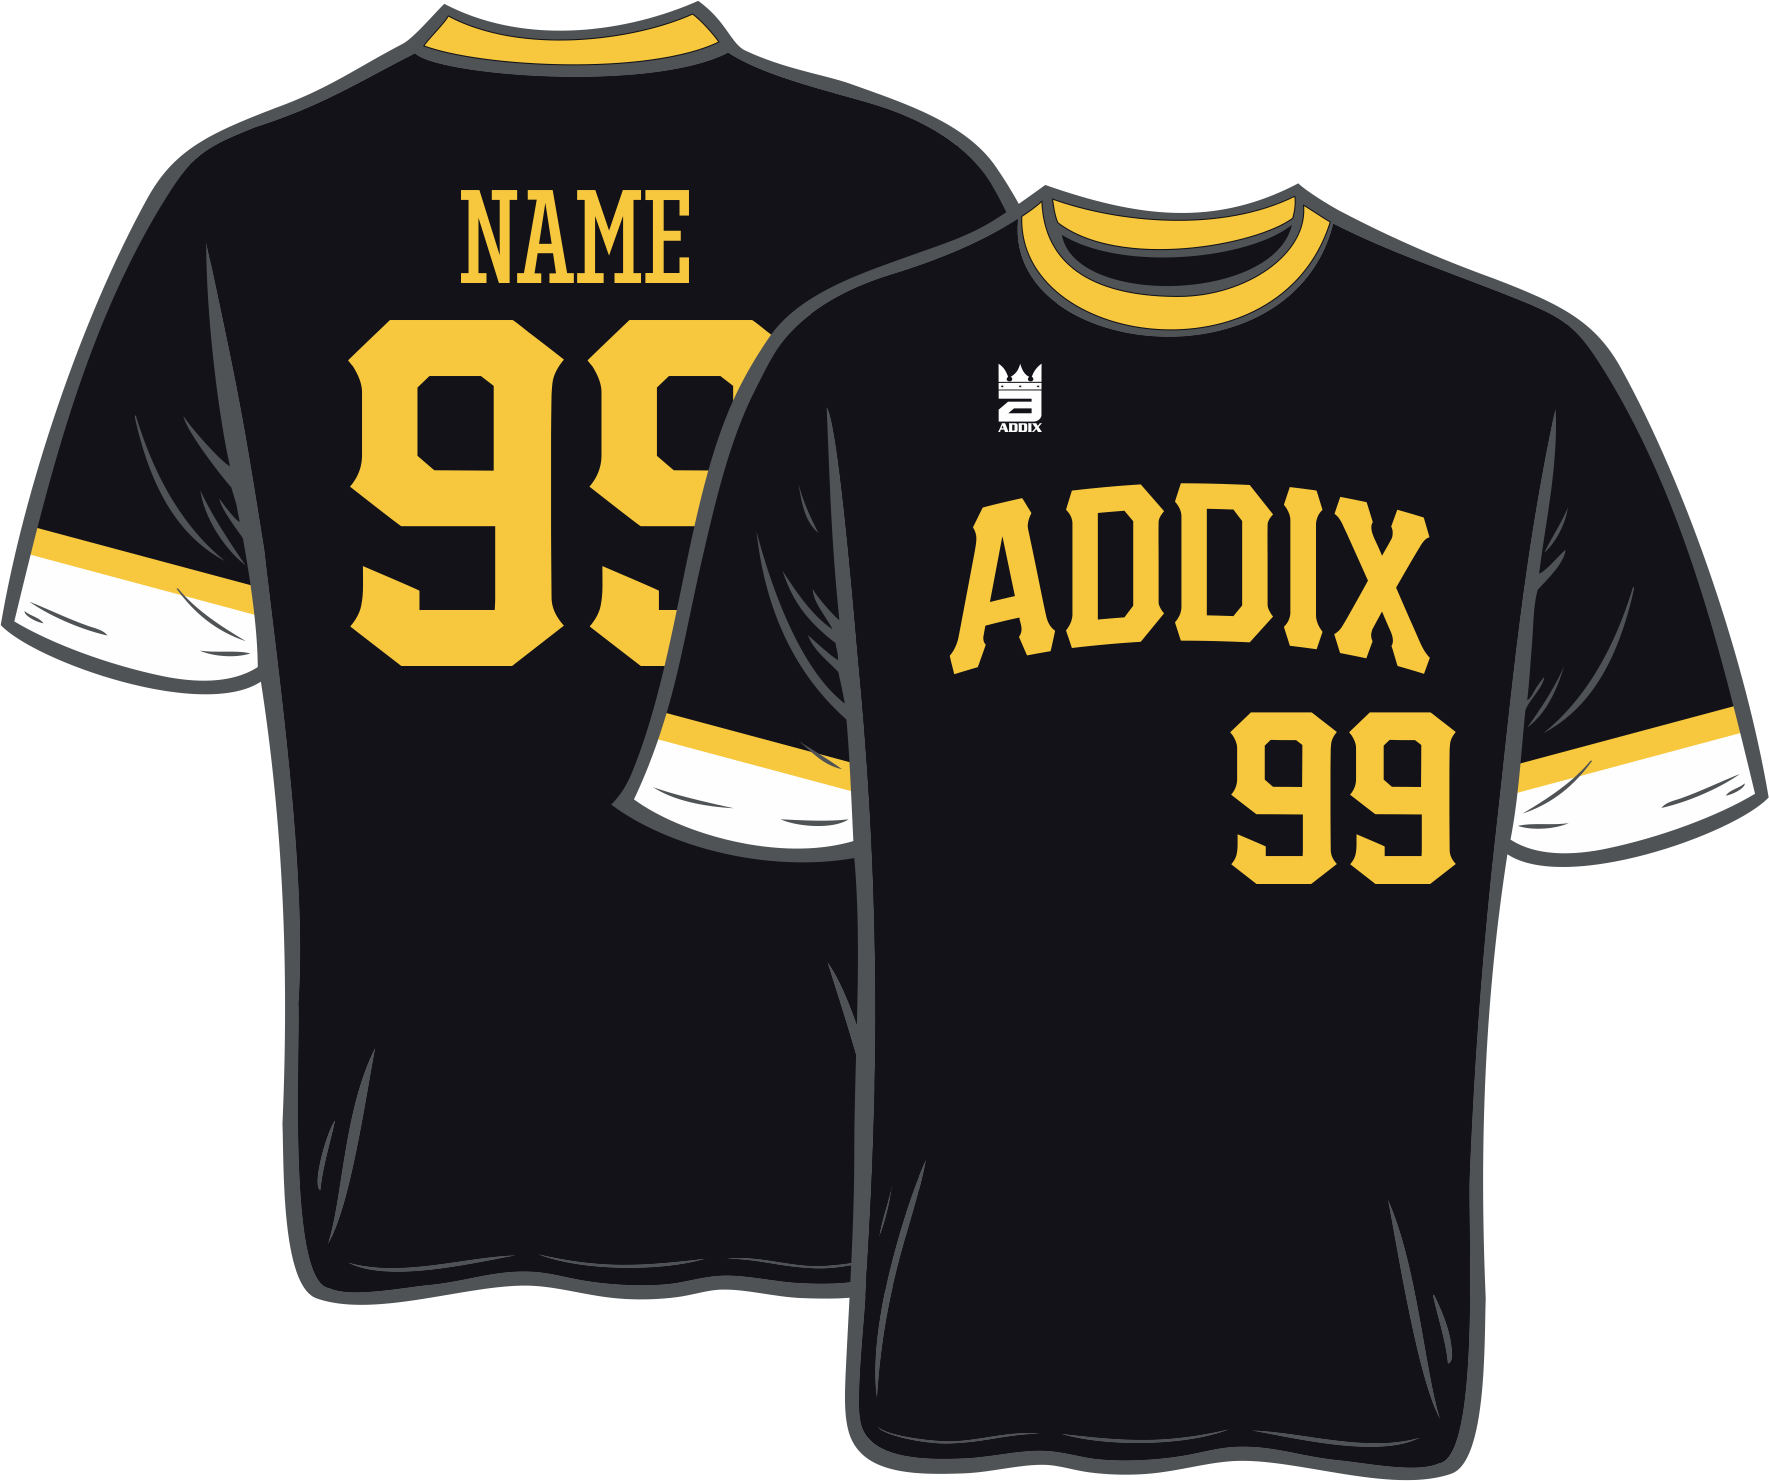 ADDIX Swashbuckler